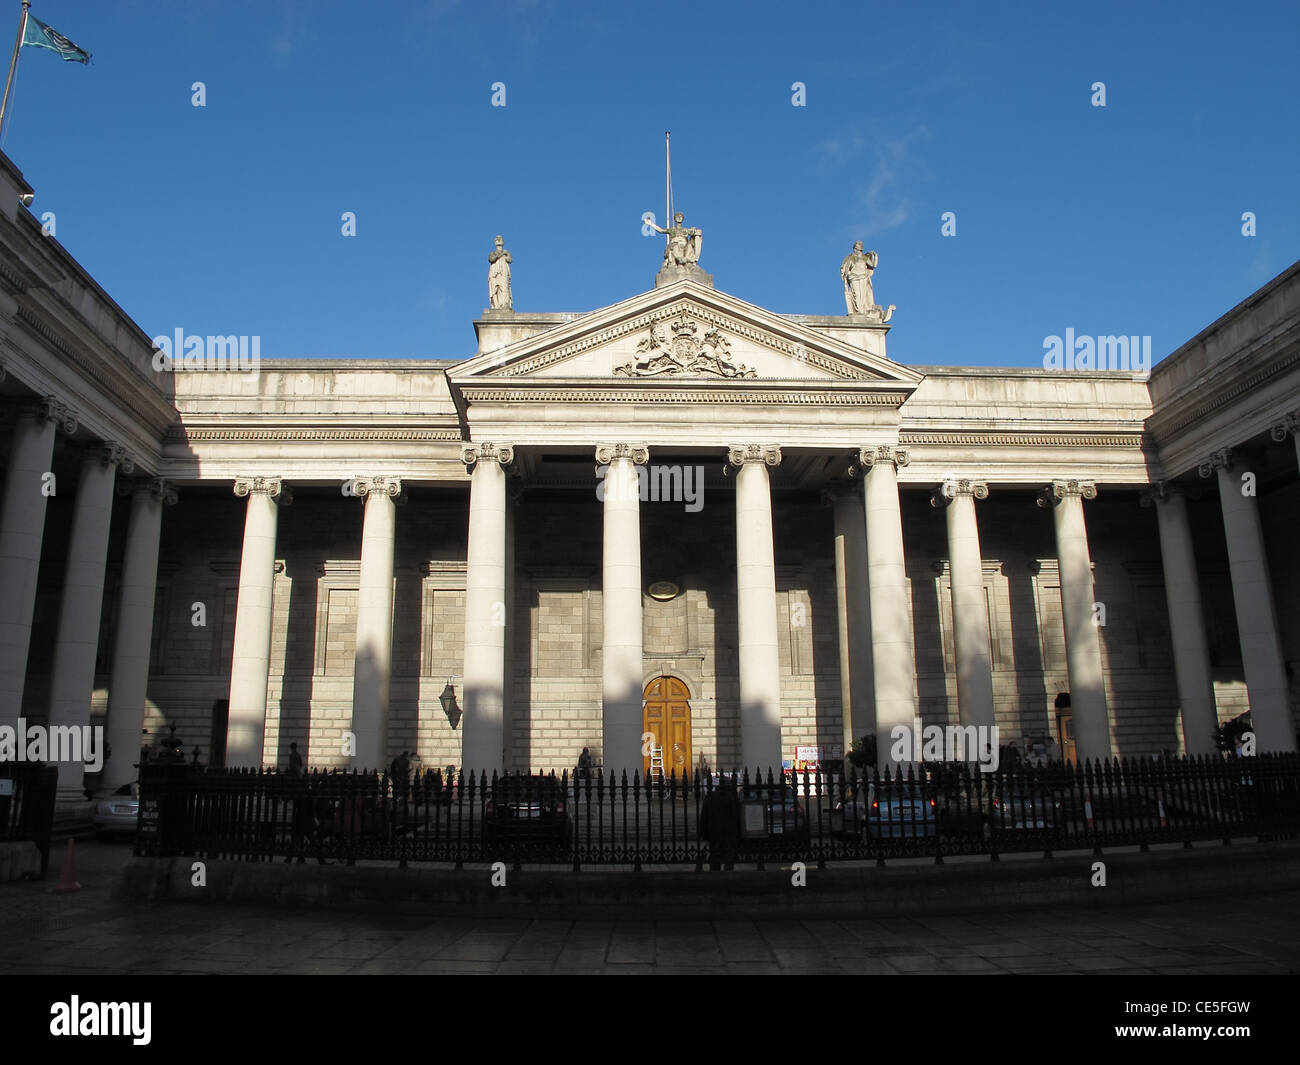 The Bank of Ireland Building in College Green, Dublin, Ireland Stock Photo